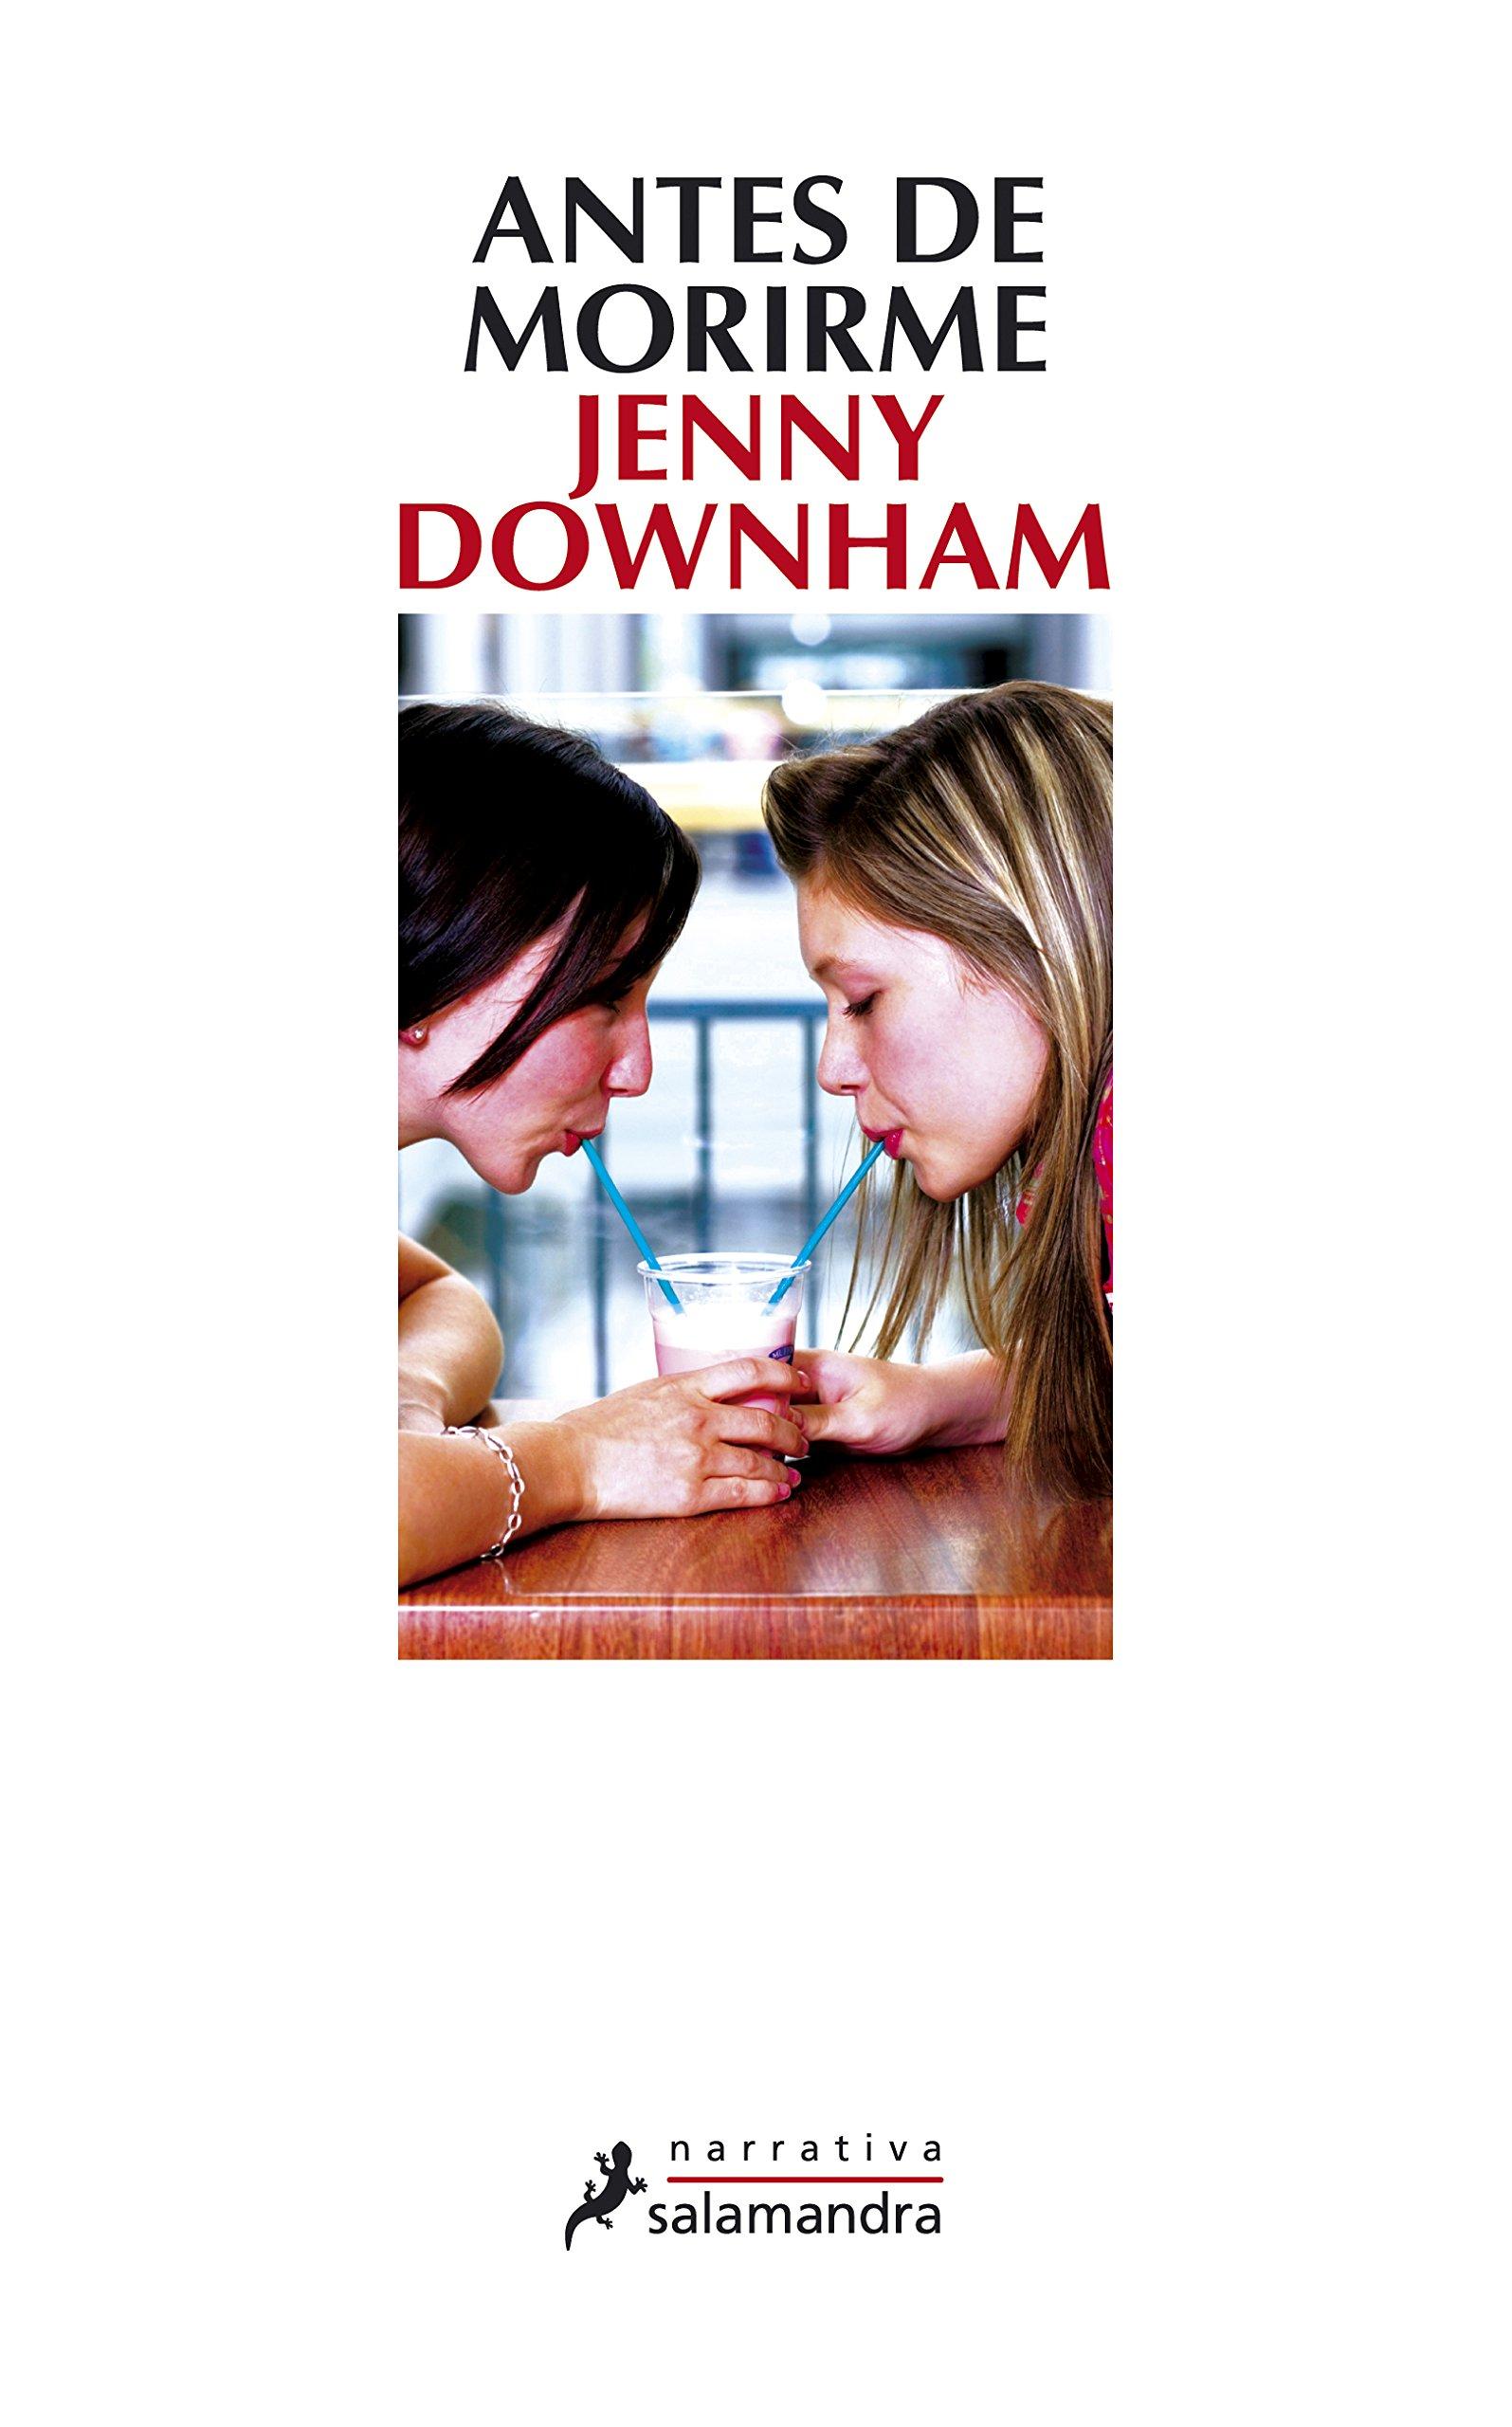 ANTES DE MORIRME (Spanish Edition): DOWNHAM JENNY: 9788498382075: Amazon.com: Books